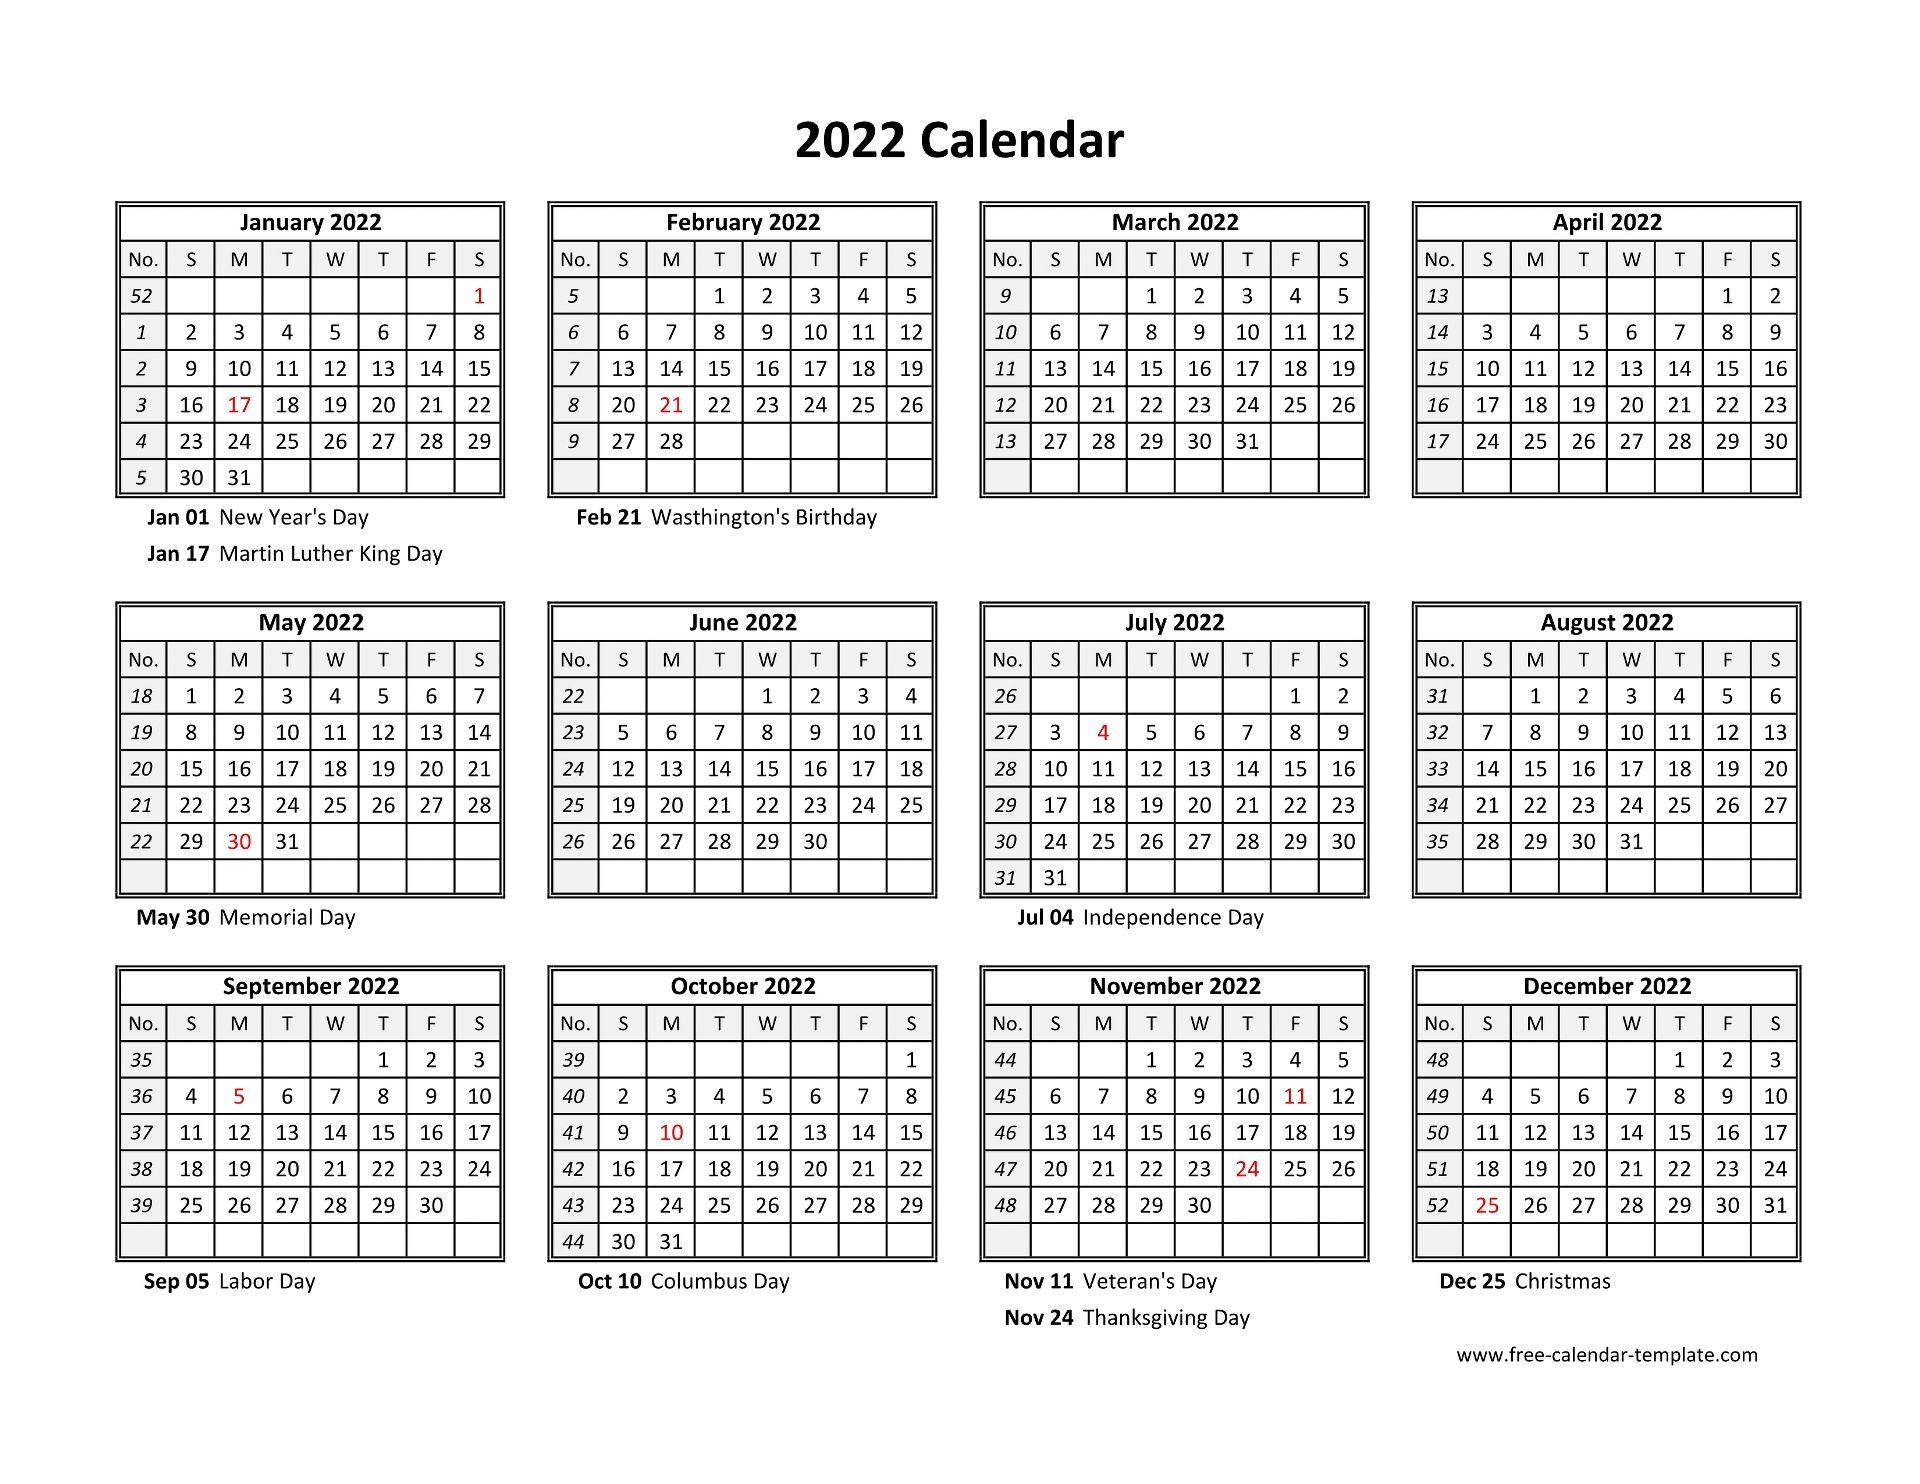 2022 Calendar By Month.Printable Yearly Calendar 2022 Free Calendar Template Com